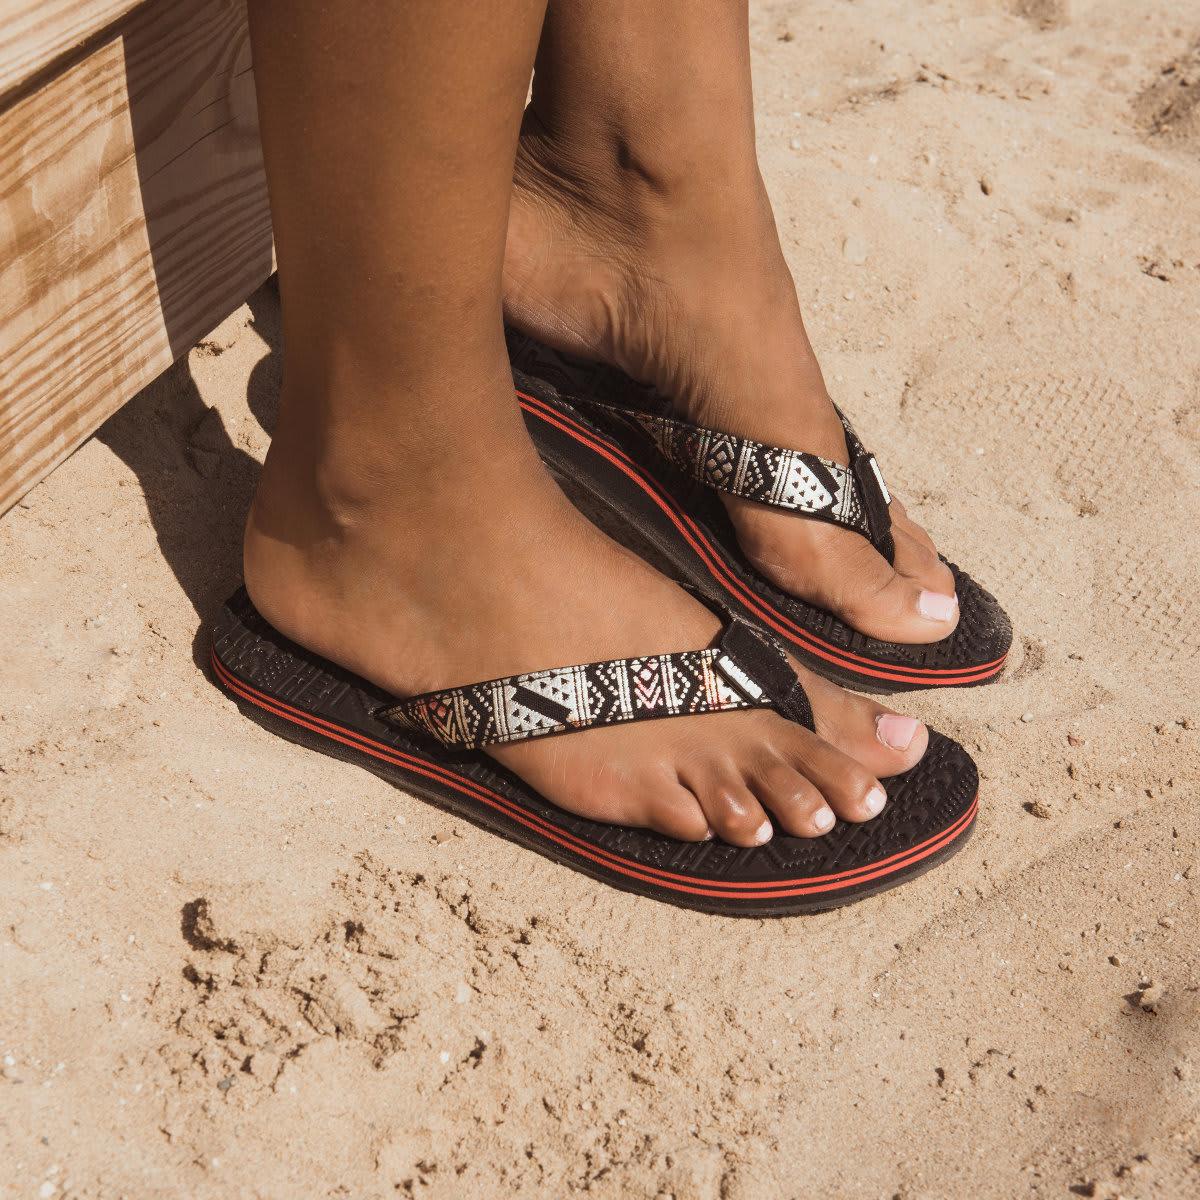 33c8f8abd023 MUK LUKS ® Emma Flip Flops just  14.99 + FREE Shipping! 4 Styles